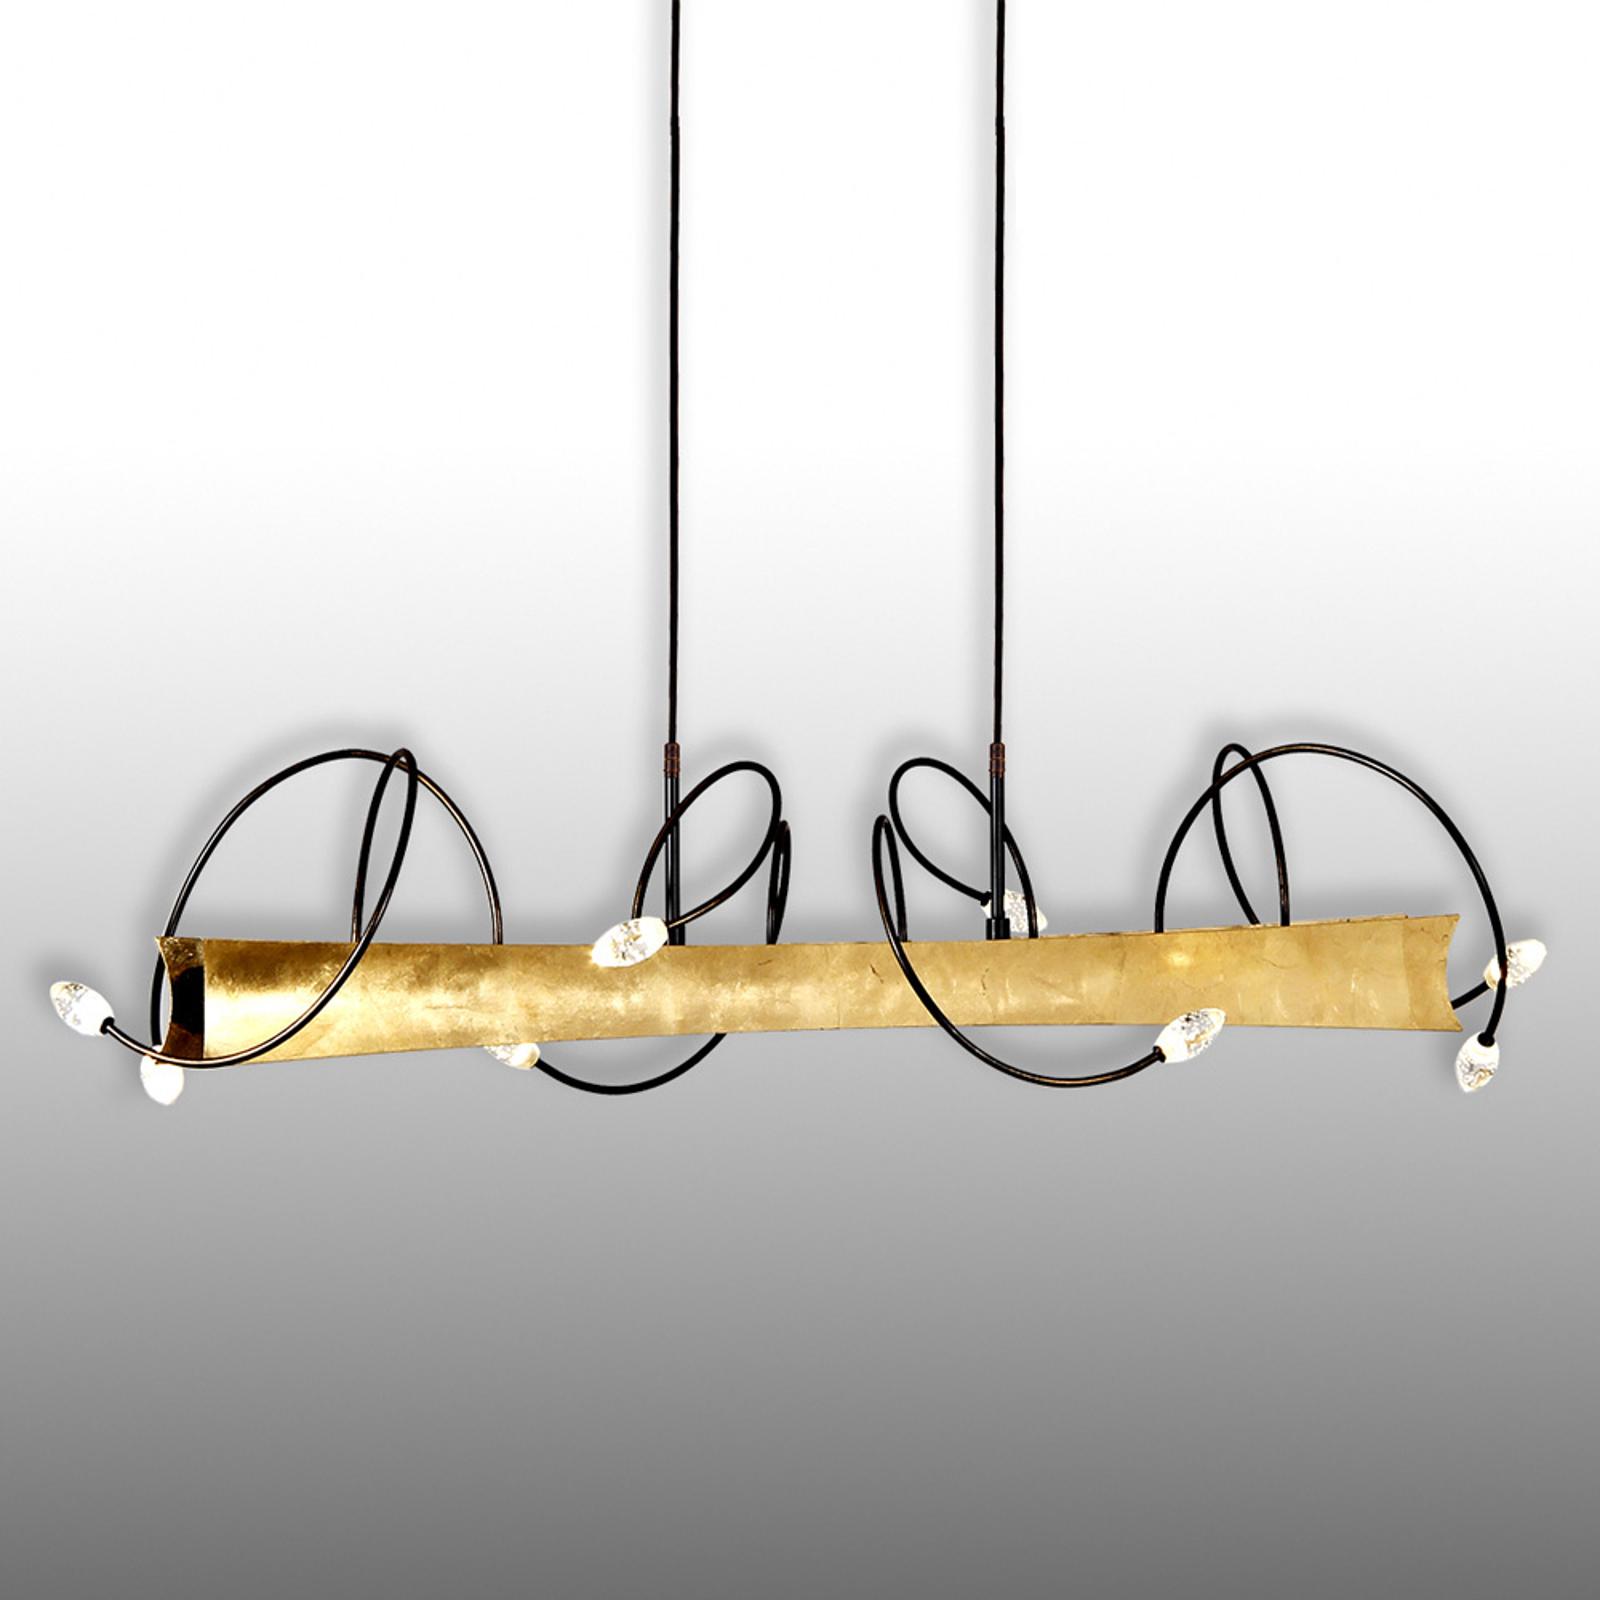 Donna decorative LED hanging light_6528185_1